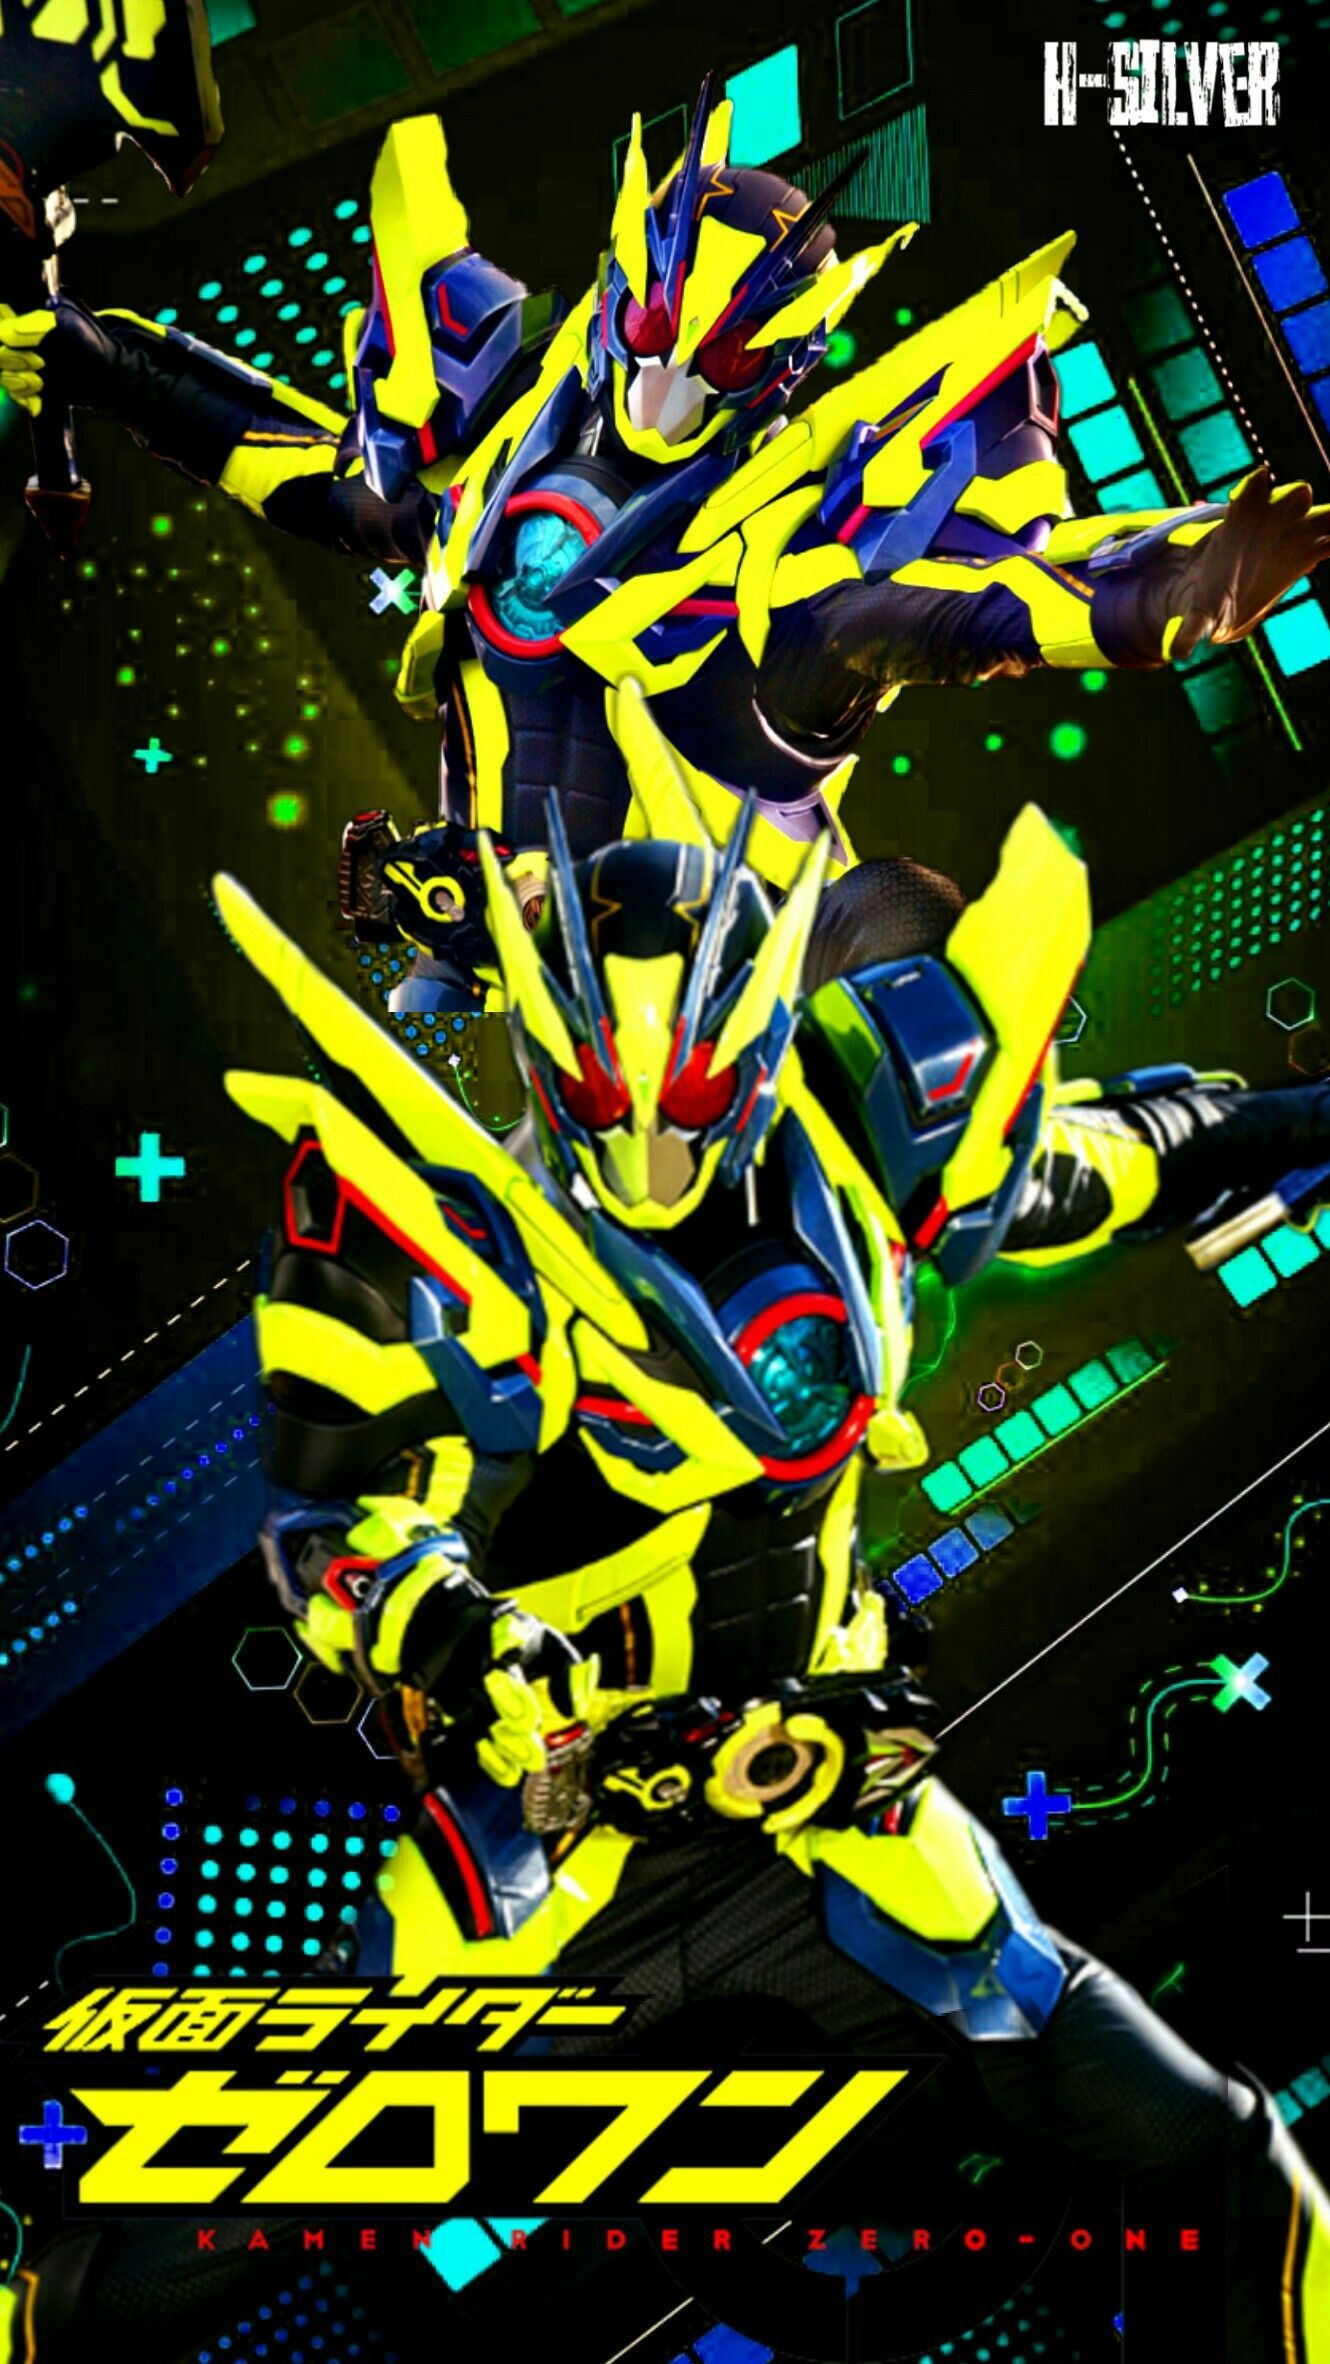 Kamen Rider Zero One Shining Assault Hopper Kamenrider